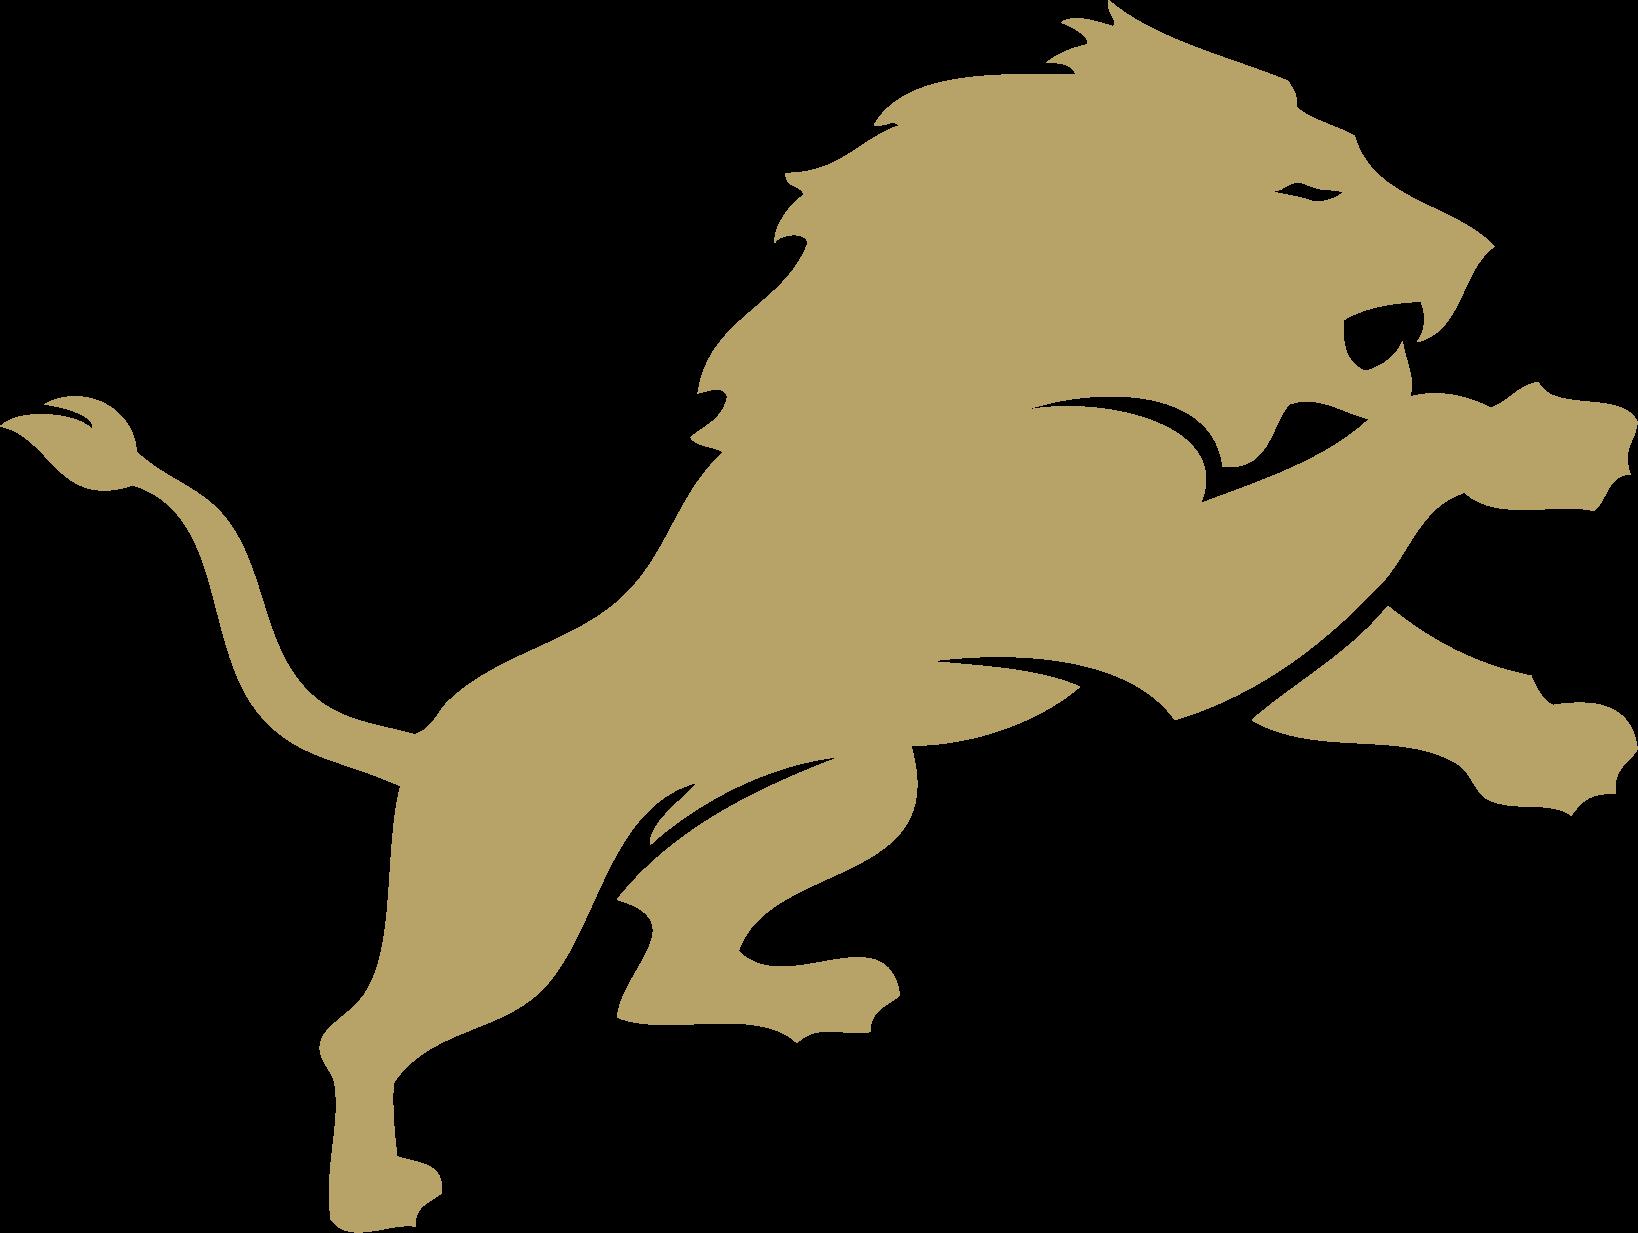 Pope John Lions logo